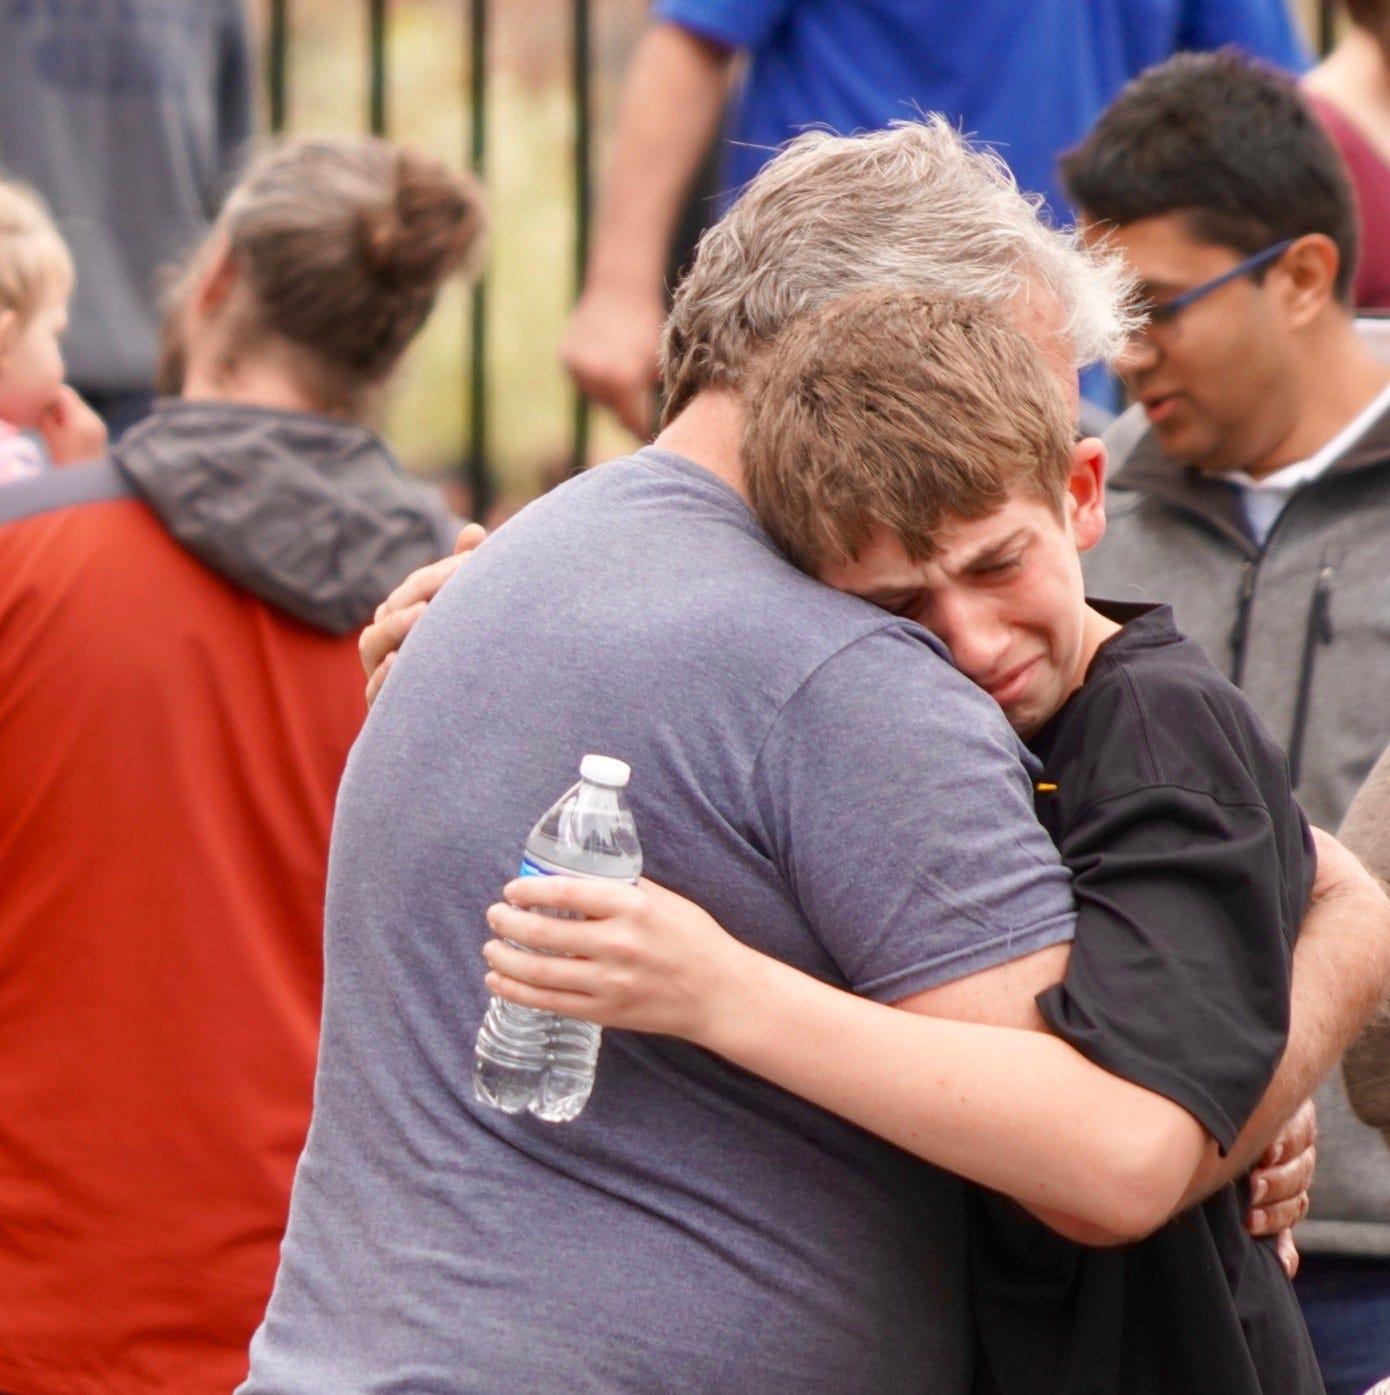 Robert Helfer, 13, hugs his grandfather, Shawn Helfer, 57, following a school shooting near Denver on Tuesday.